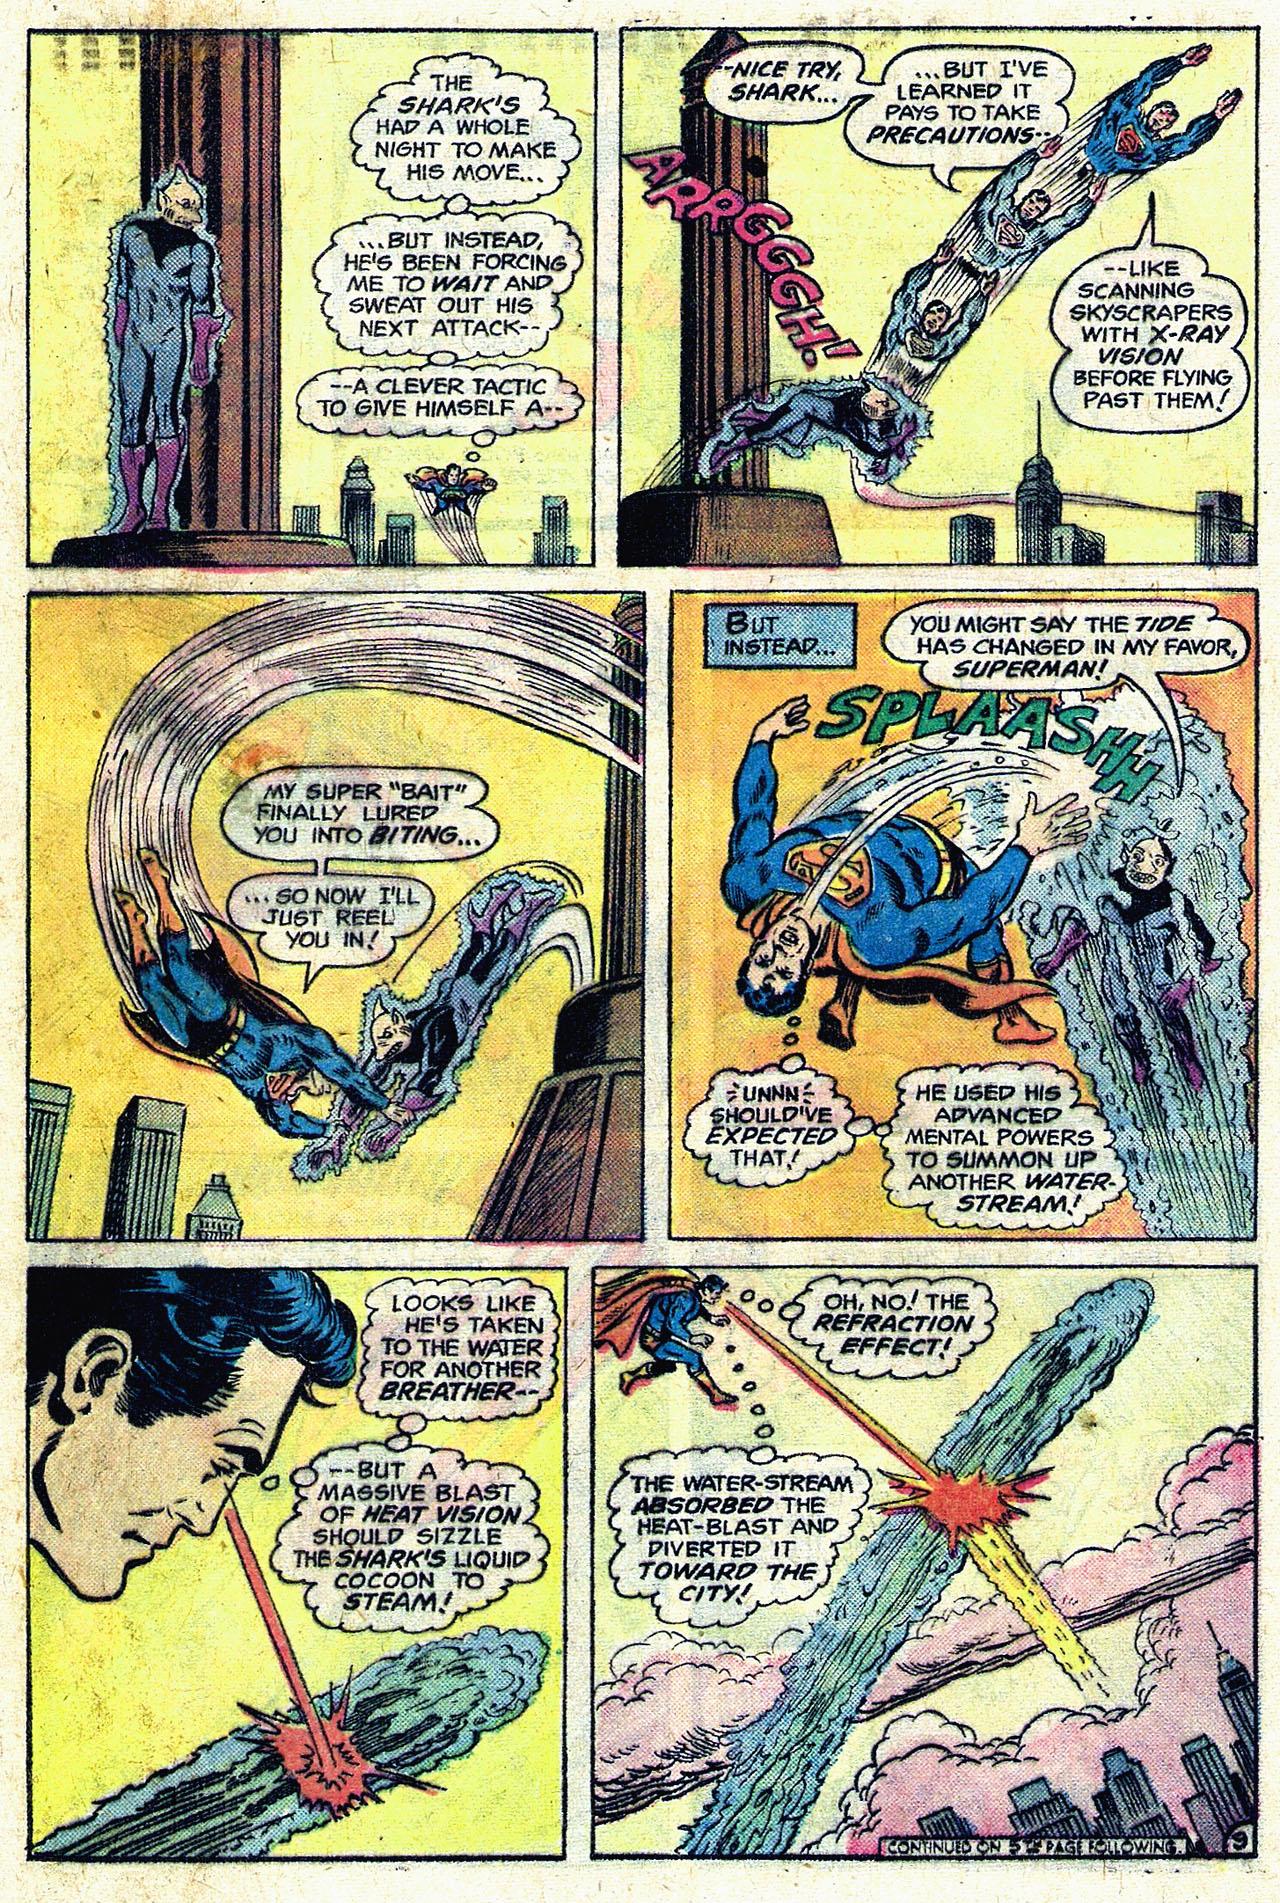 Action Comics (1938) 456 Page 15